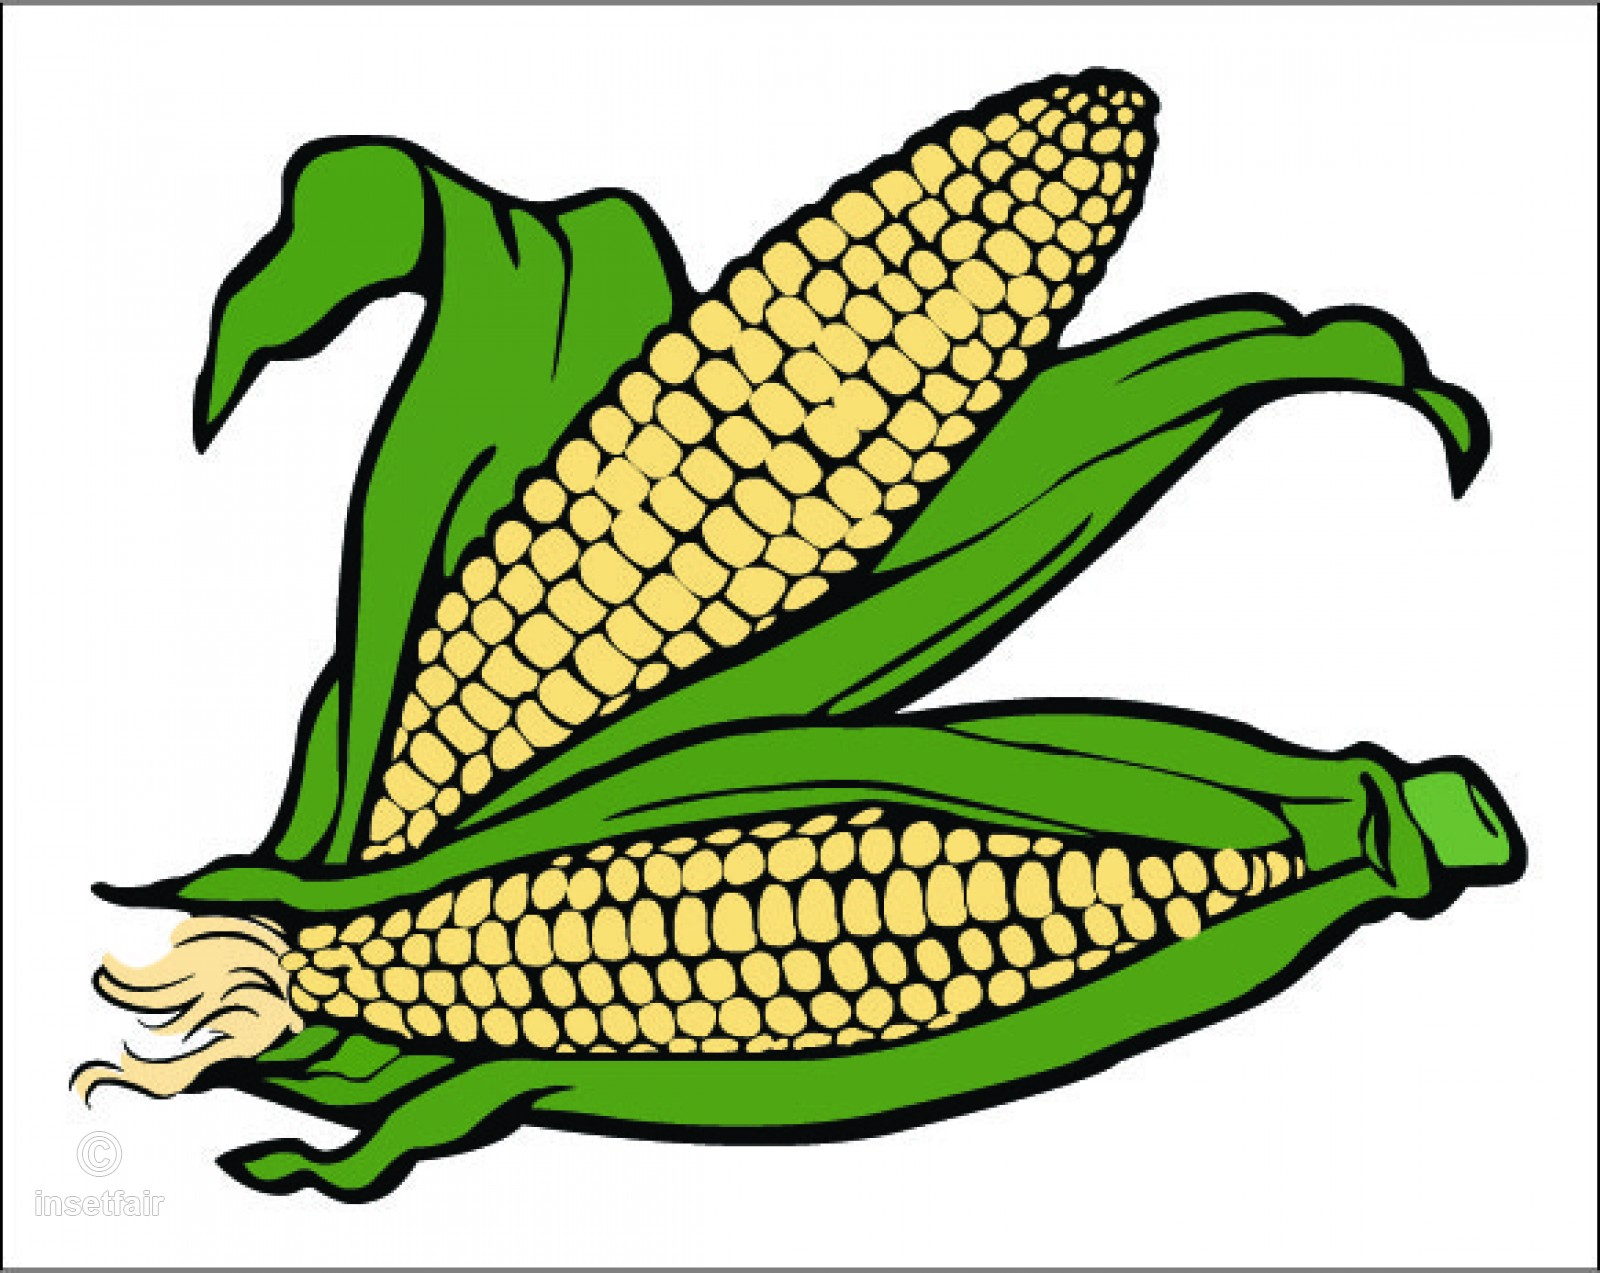 1600x1273 Corn Cartoon Clipart Drawing With Adobe Illustrator